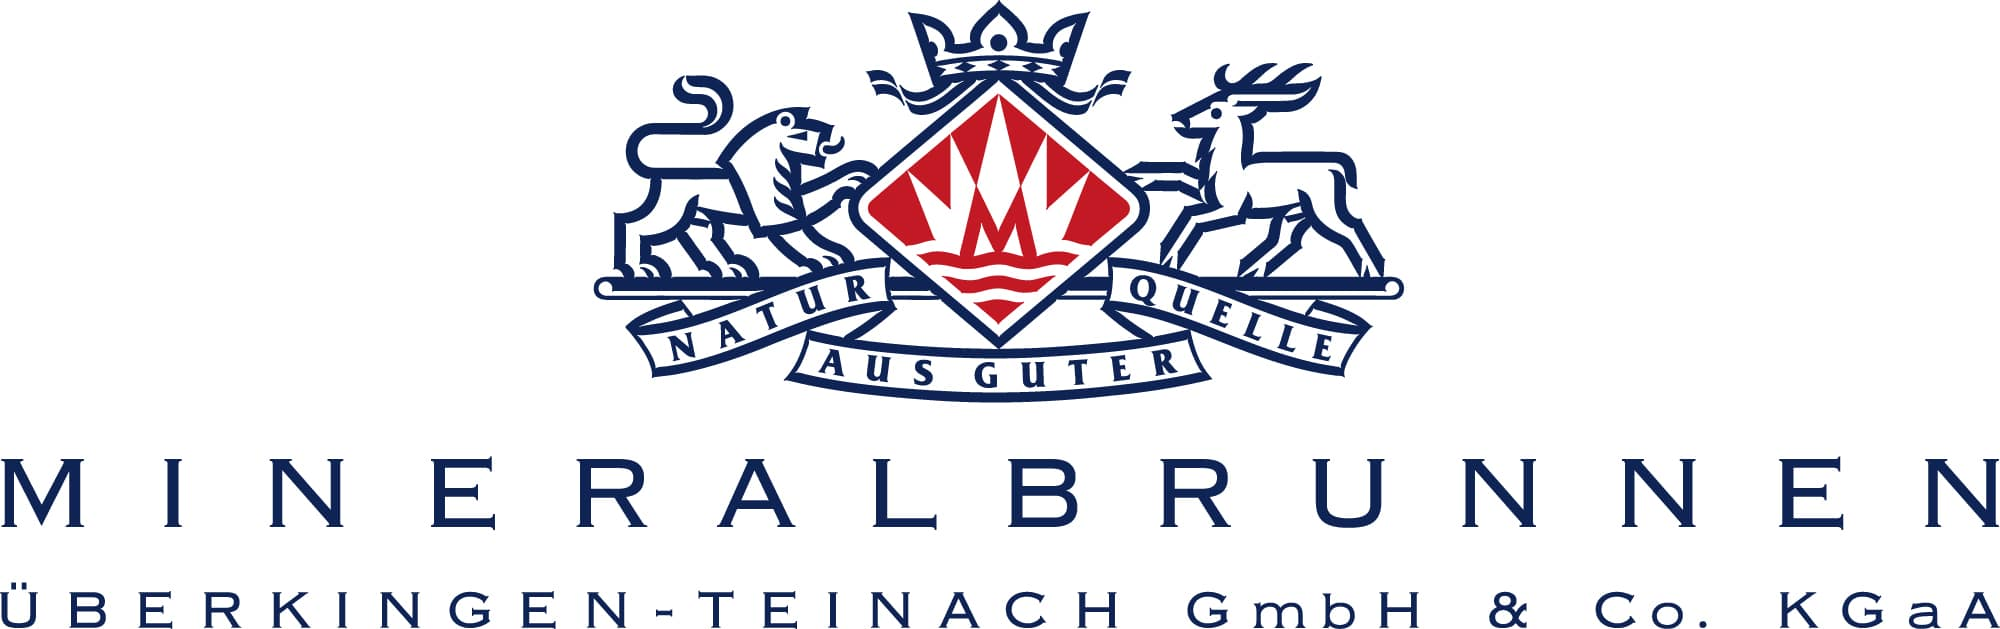 Mineralbrunnen Überkingen-Teinach GmbH & Co. KGaA Badstraße 41 D-75385 Bad Teinach-Zavelstein https://www.mineralbrunnen-kgaa.de/